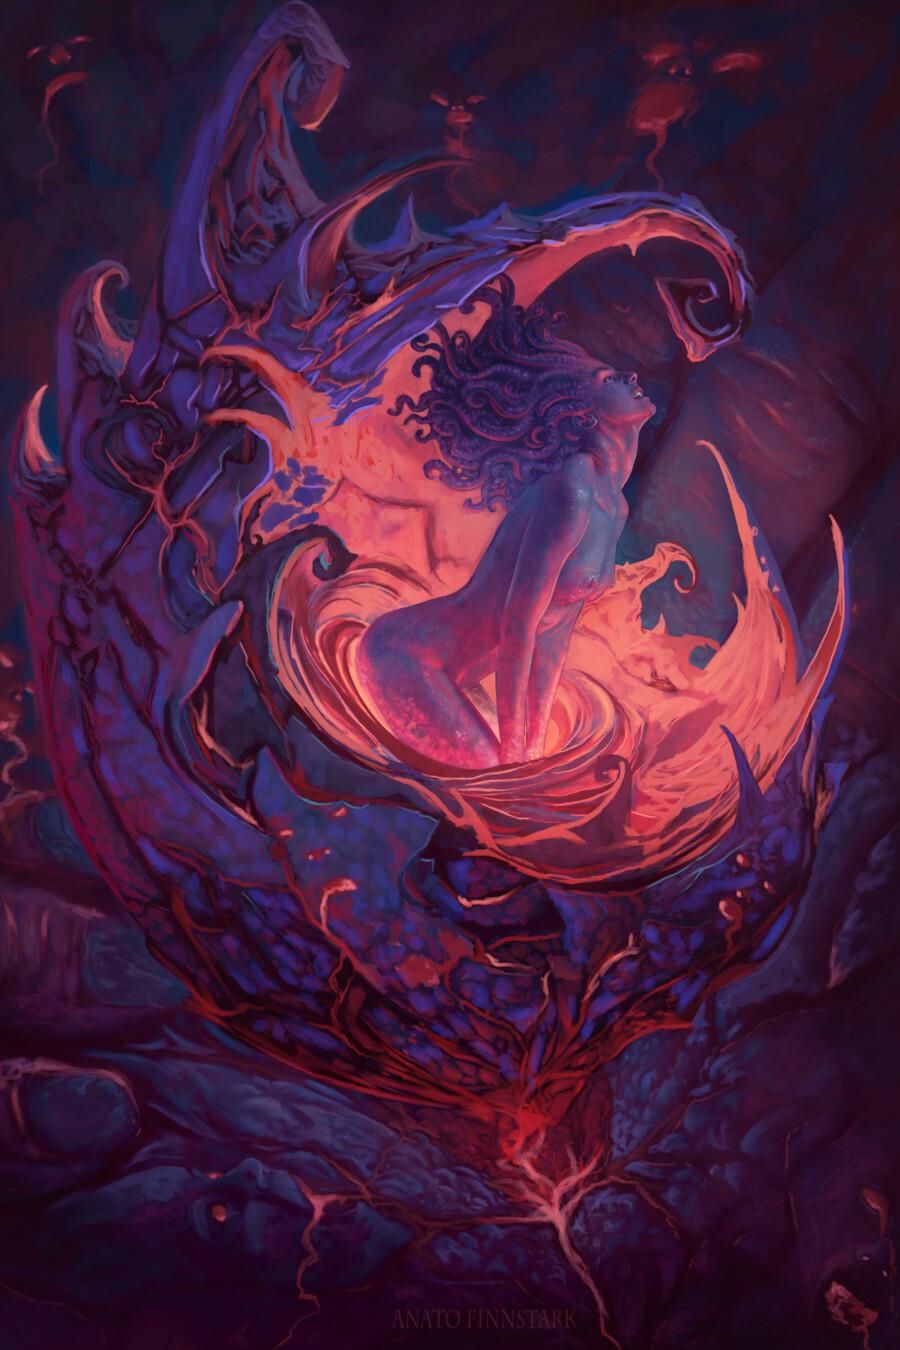 Anato finnstark anato finnstark slan whore princess of the uterine sea berserk by anatofinnstark dc5ap3x